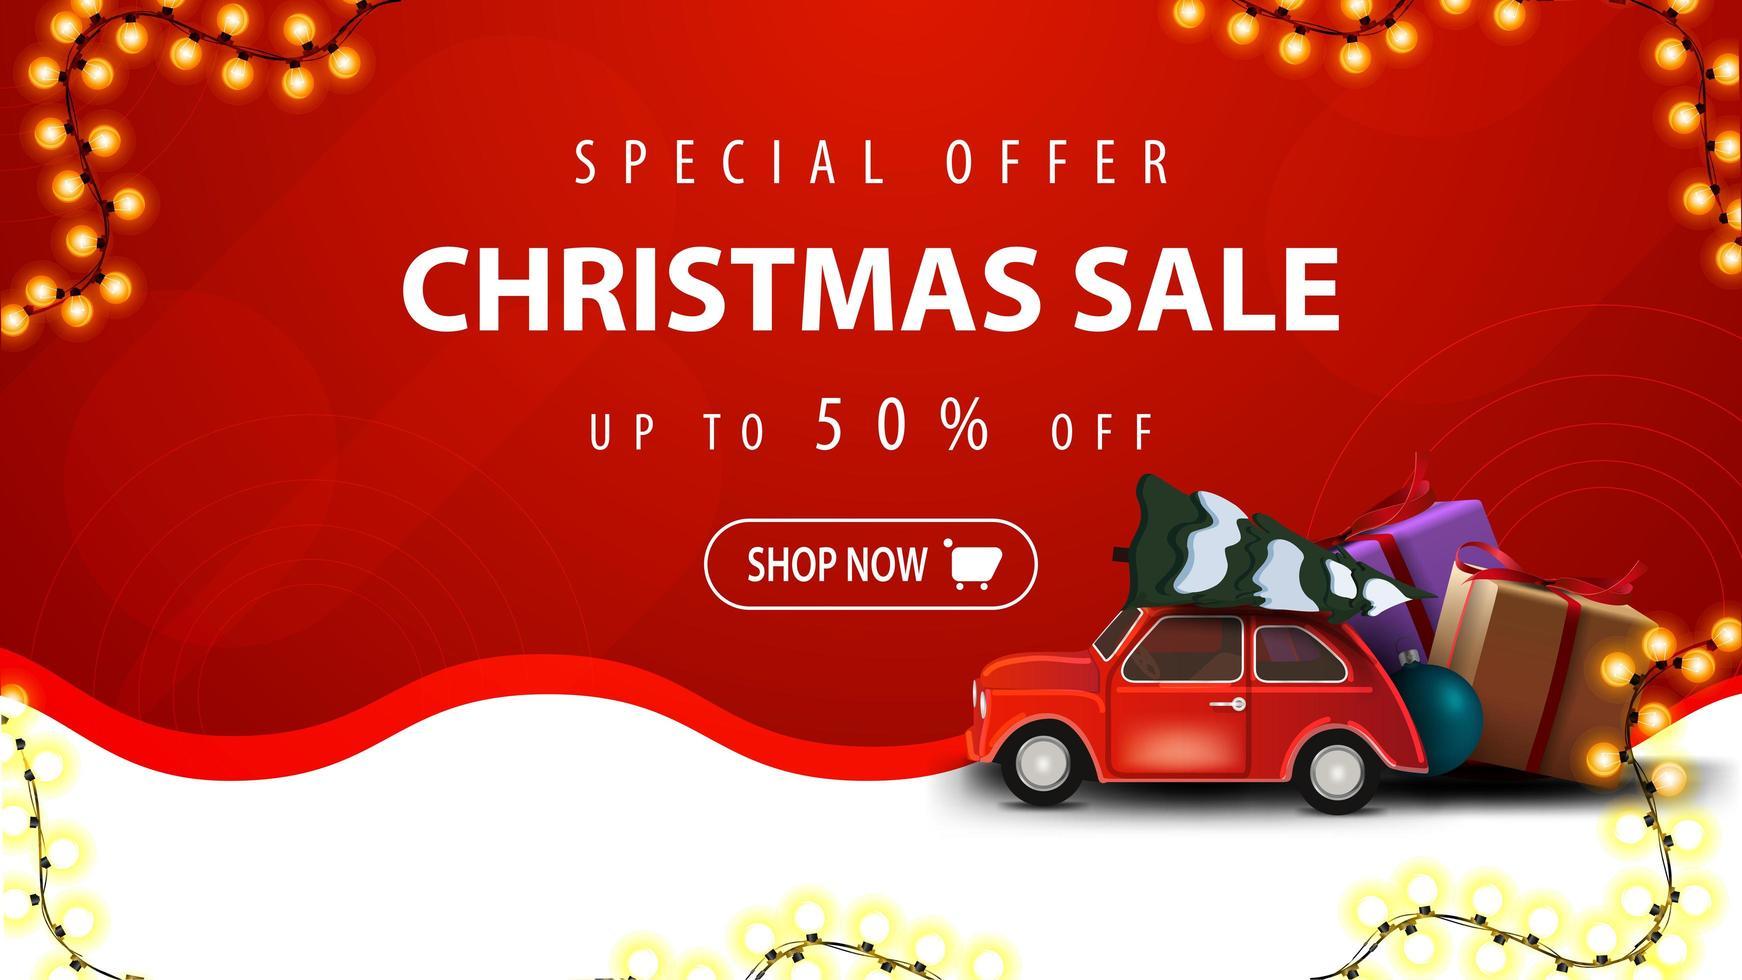 speciale aanbieding, kerstuitverkoop, tot 50 korting, witte en rode kortingsbanner met slinger, golvende lijn en rode vintage auto met kerstboom vector